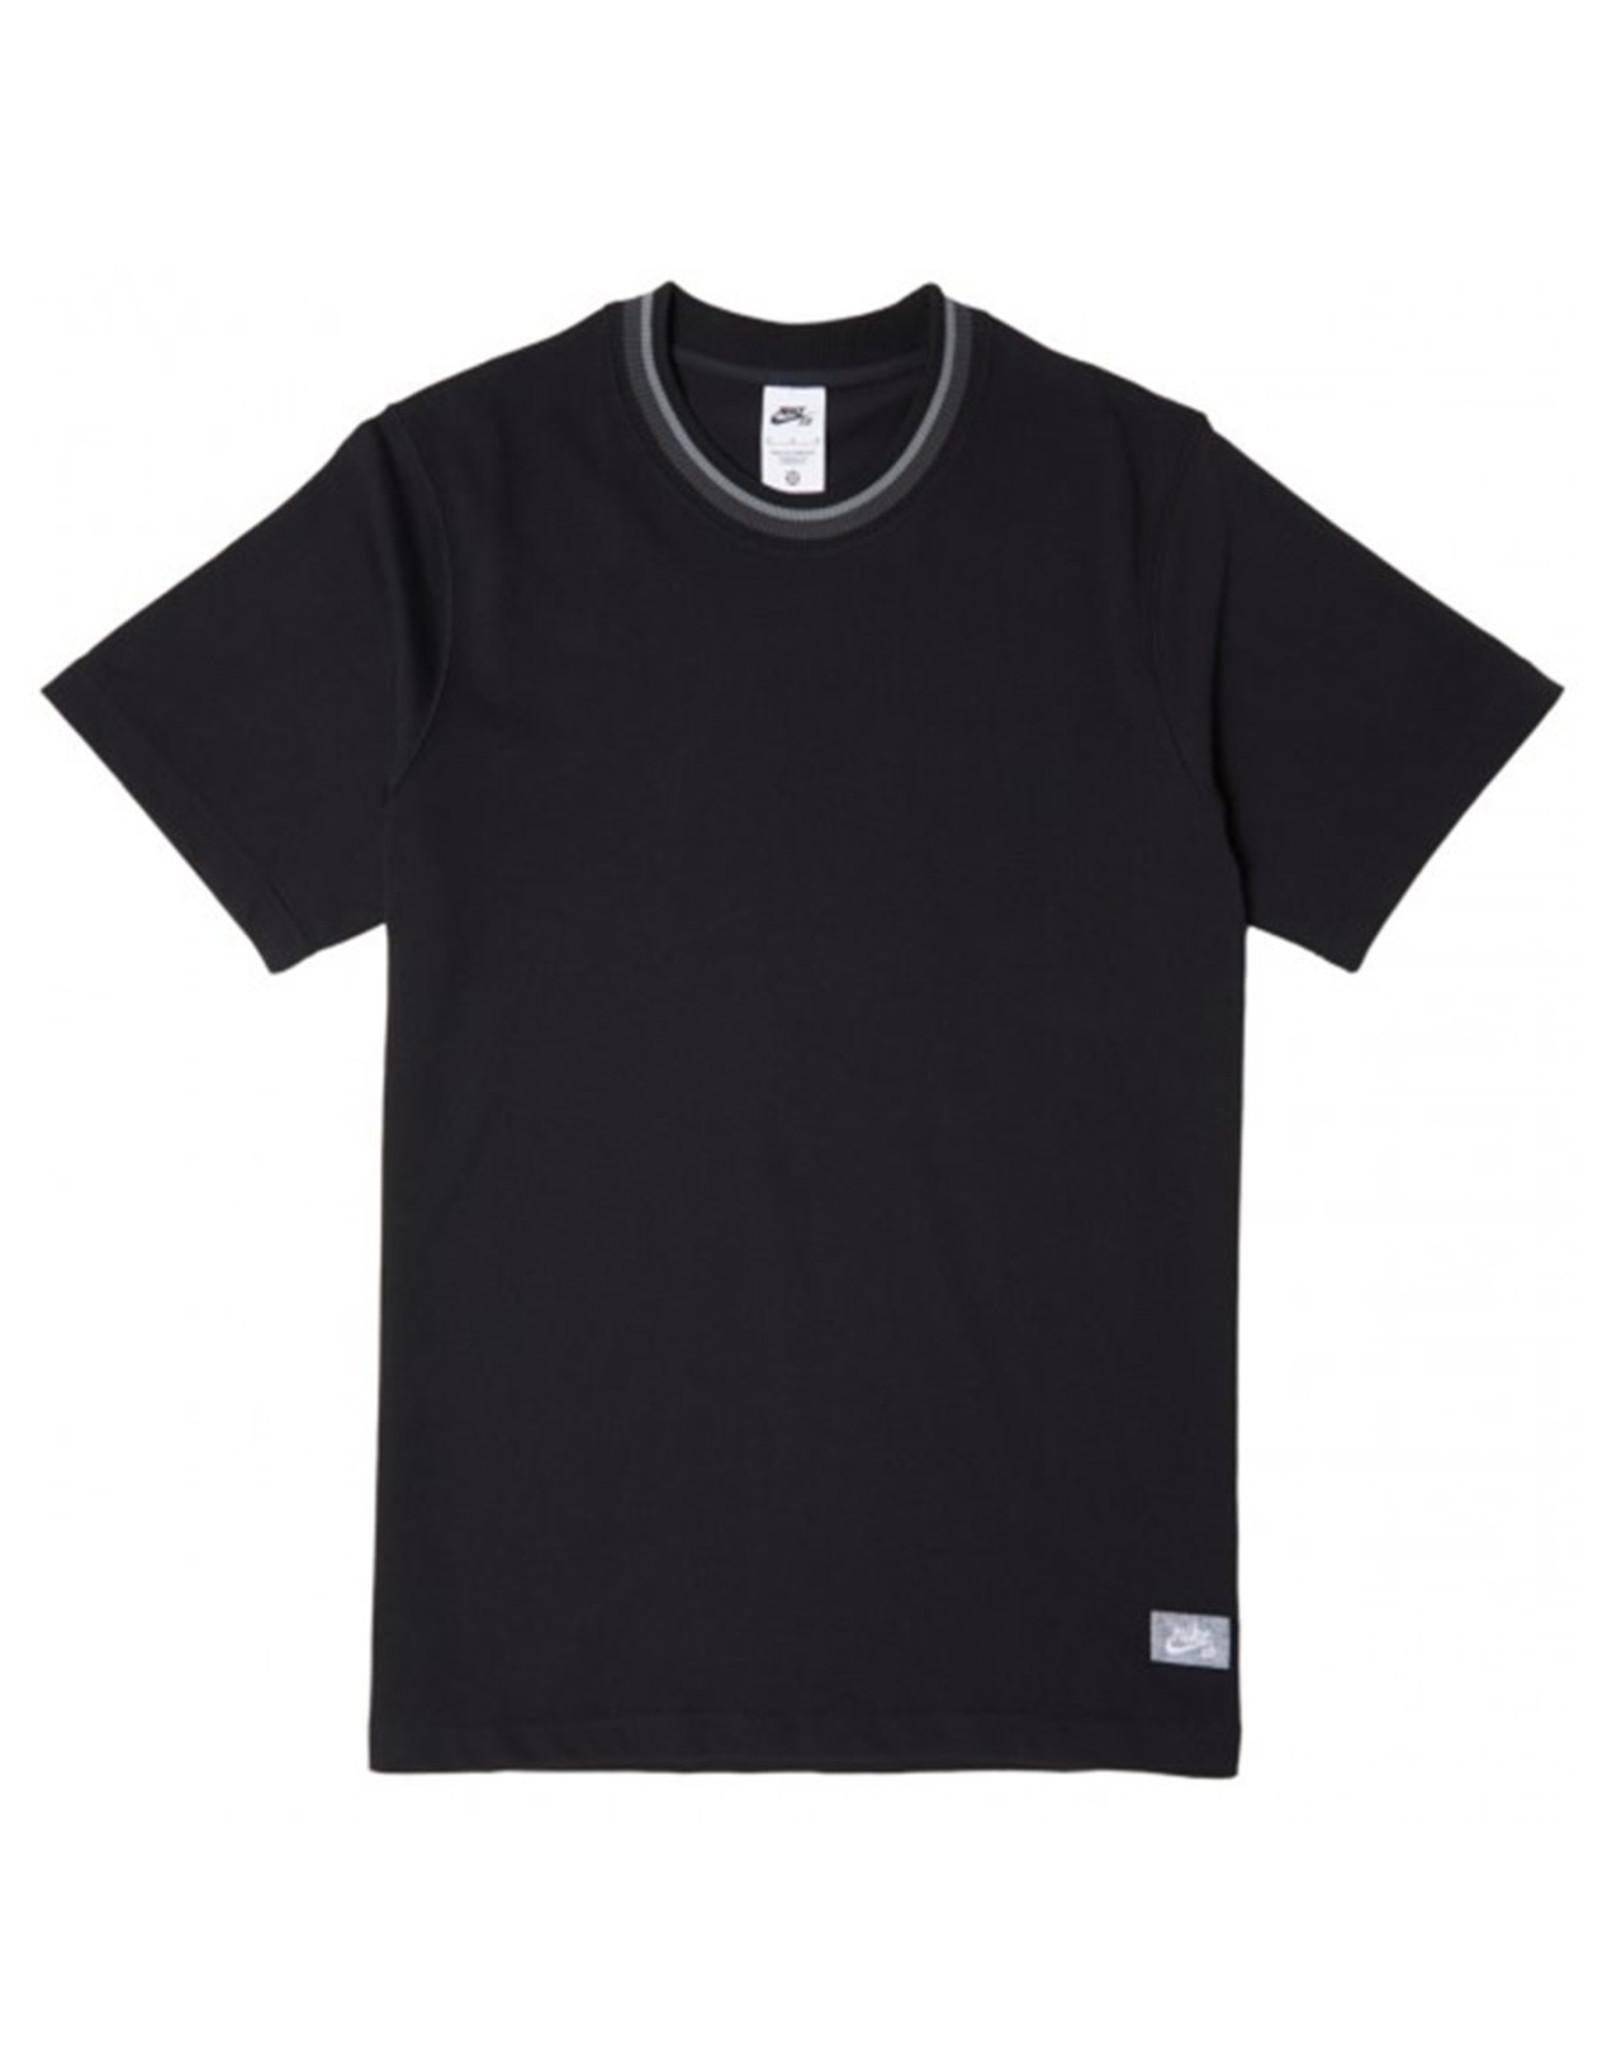 Nike SB Nike SB Tee Sustainable Cotton S/S (Black)